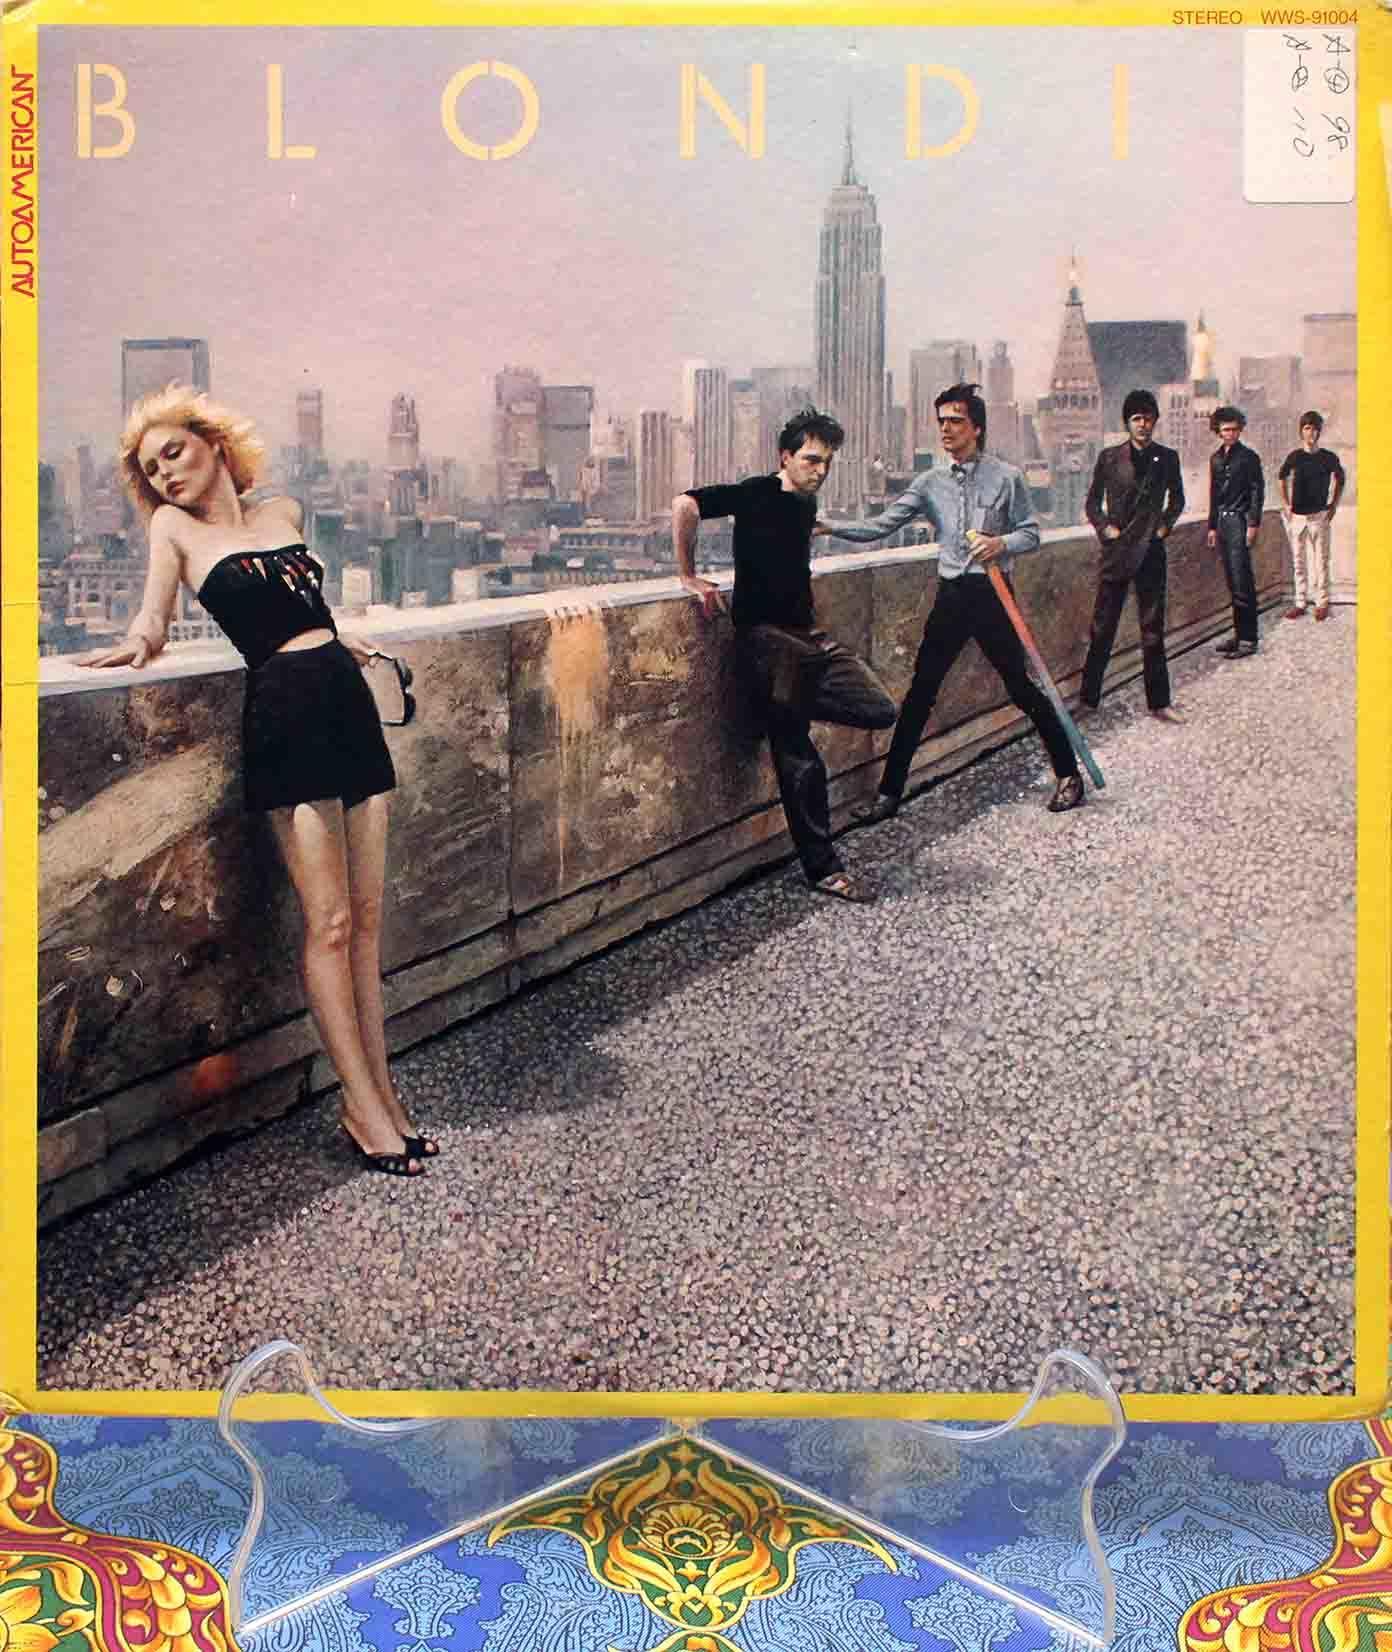 Blondie – Auto America 01